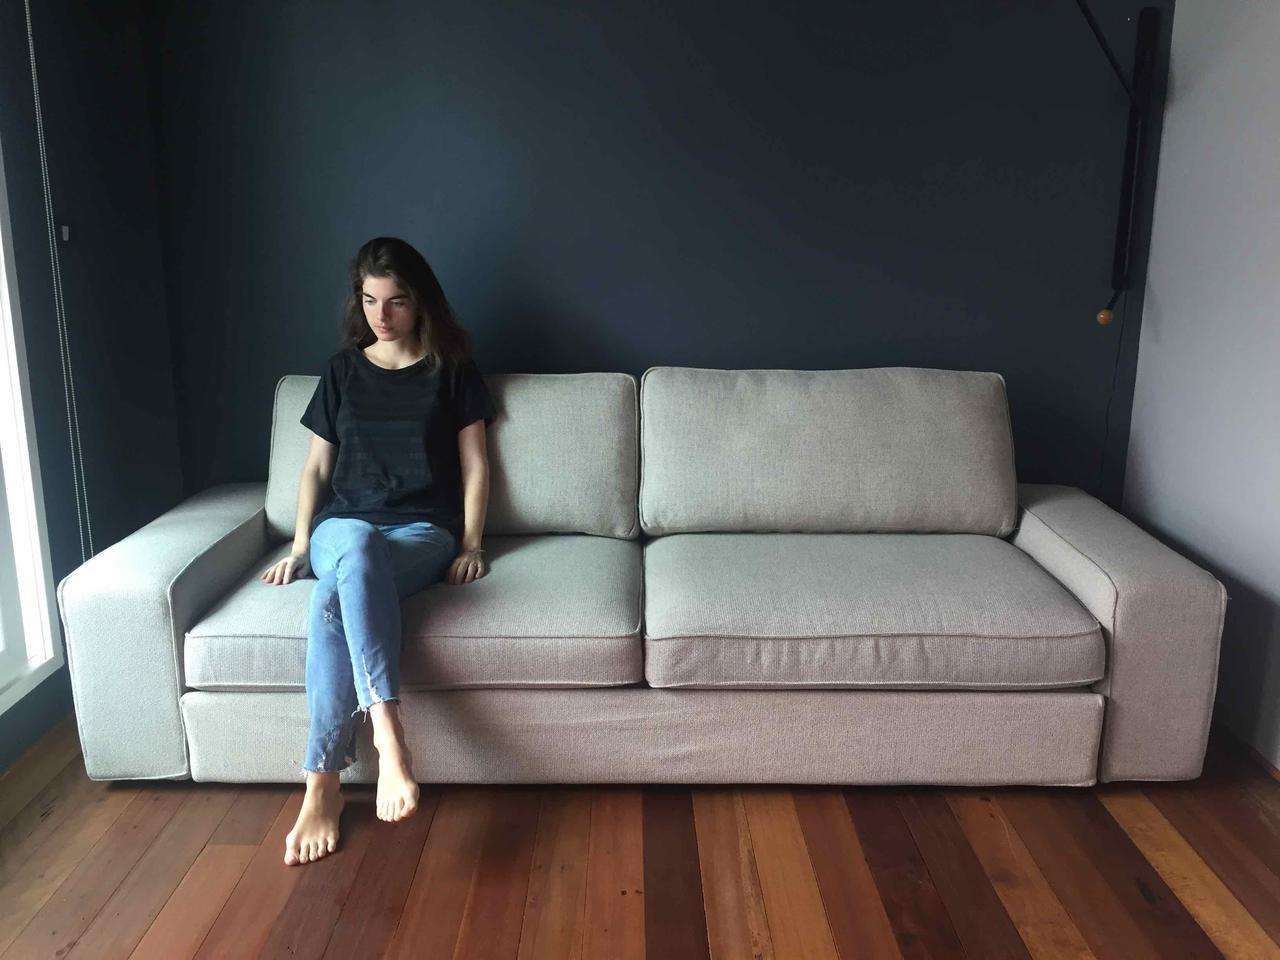 Sofa Bed Ikea 3 Seats รุ่น KIVIK รูปที่ 2